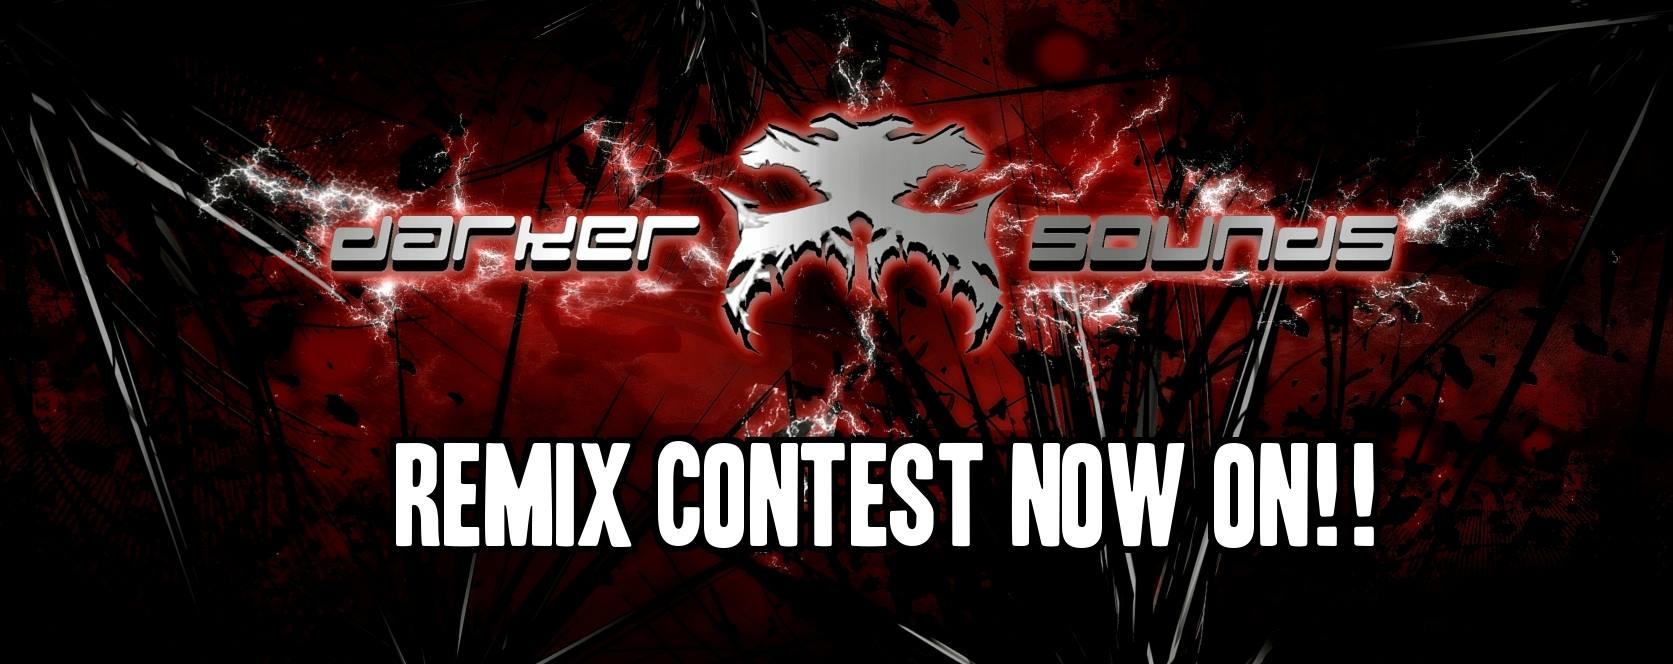 Darker Sounds Remix Contest 2016